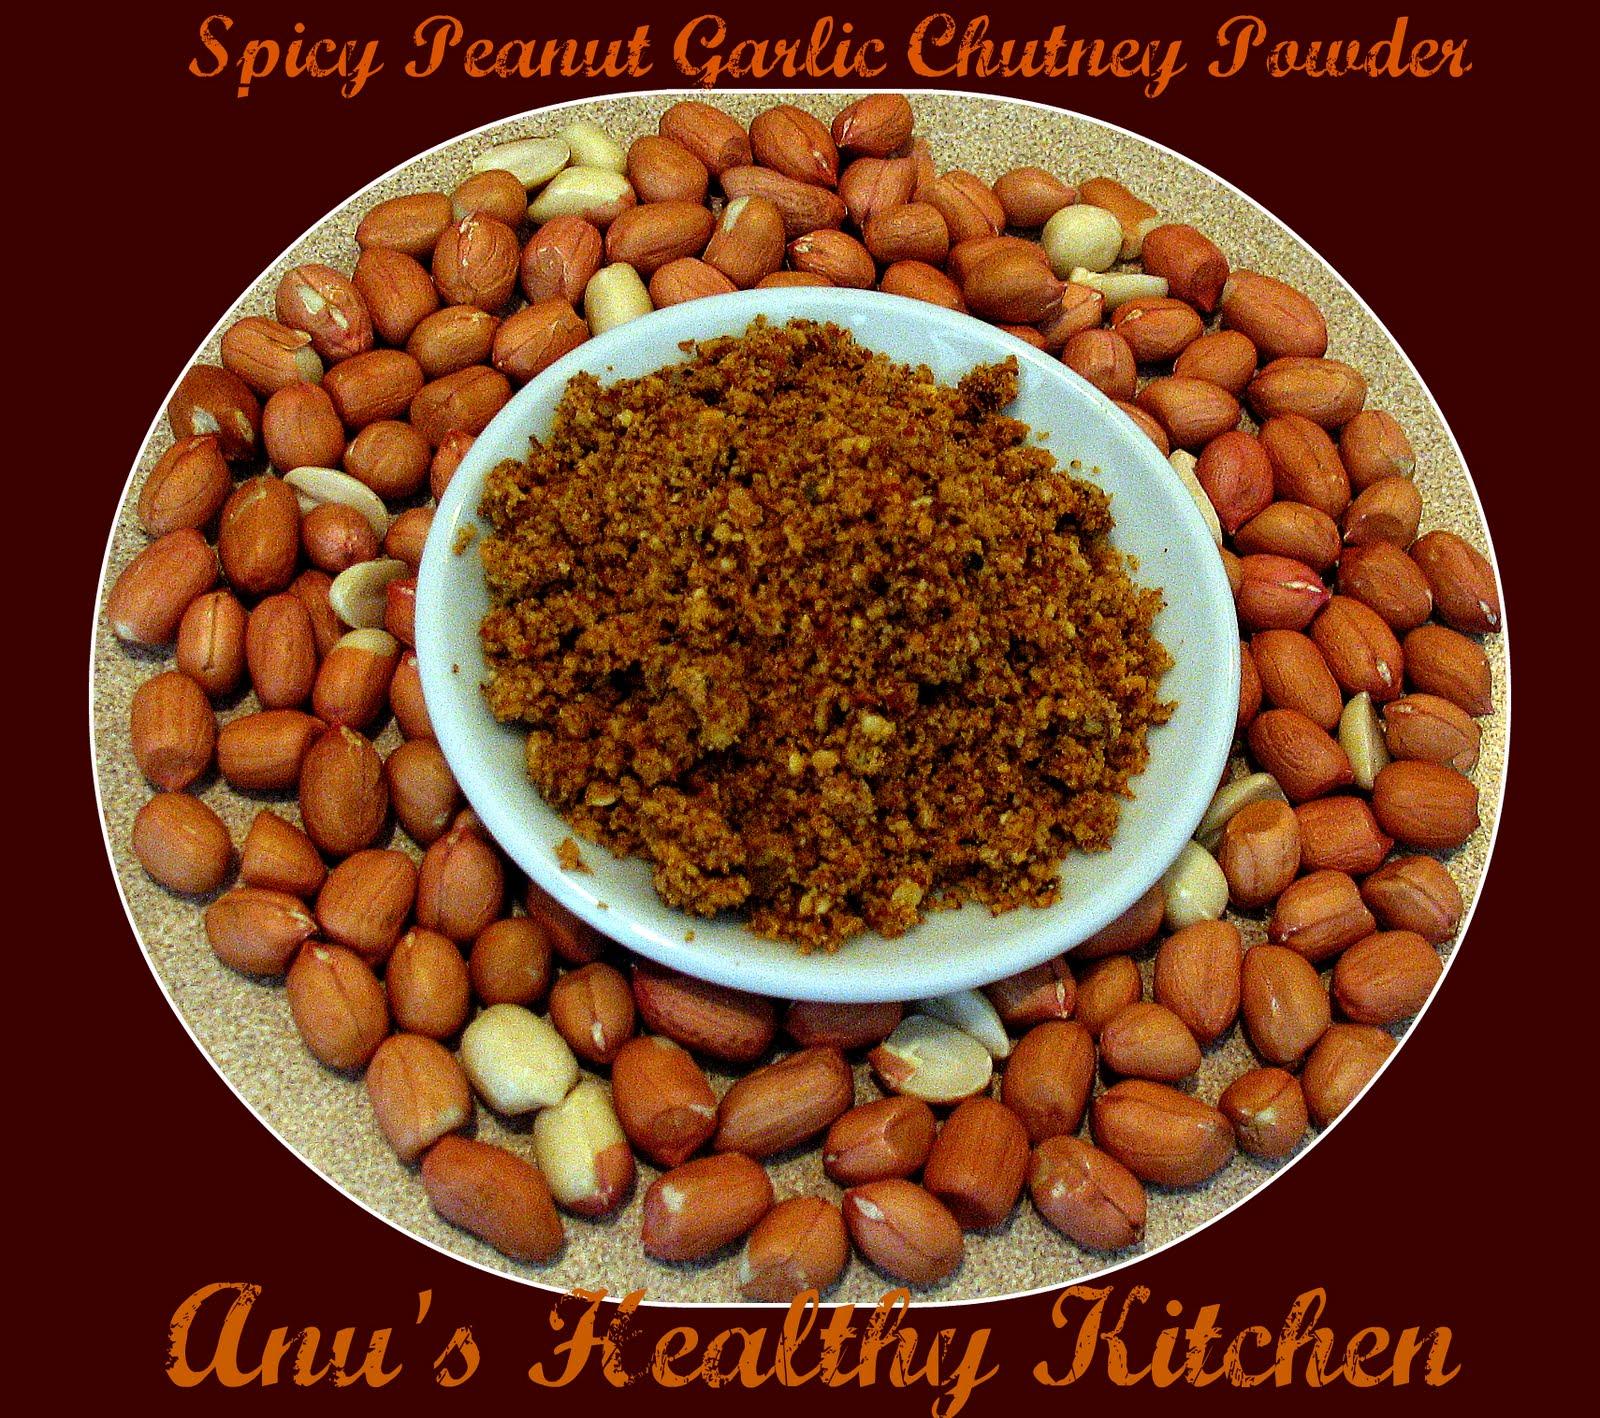 Spicy Peanut Garlic Chutney Powder | the brown eyed bookie